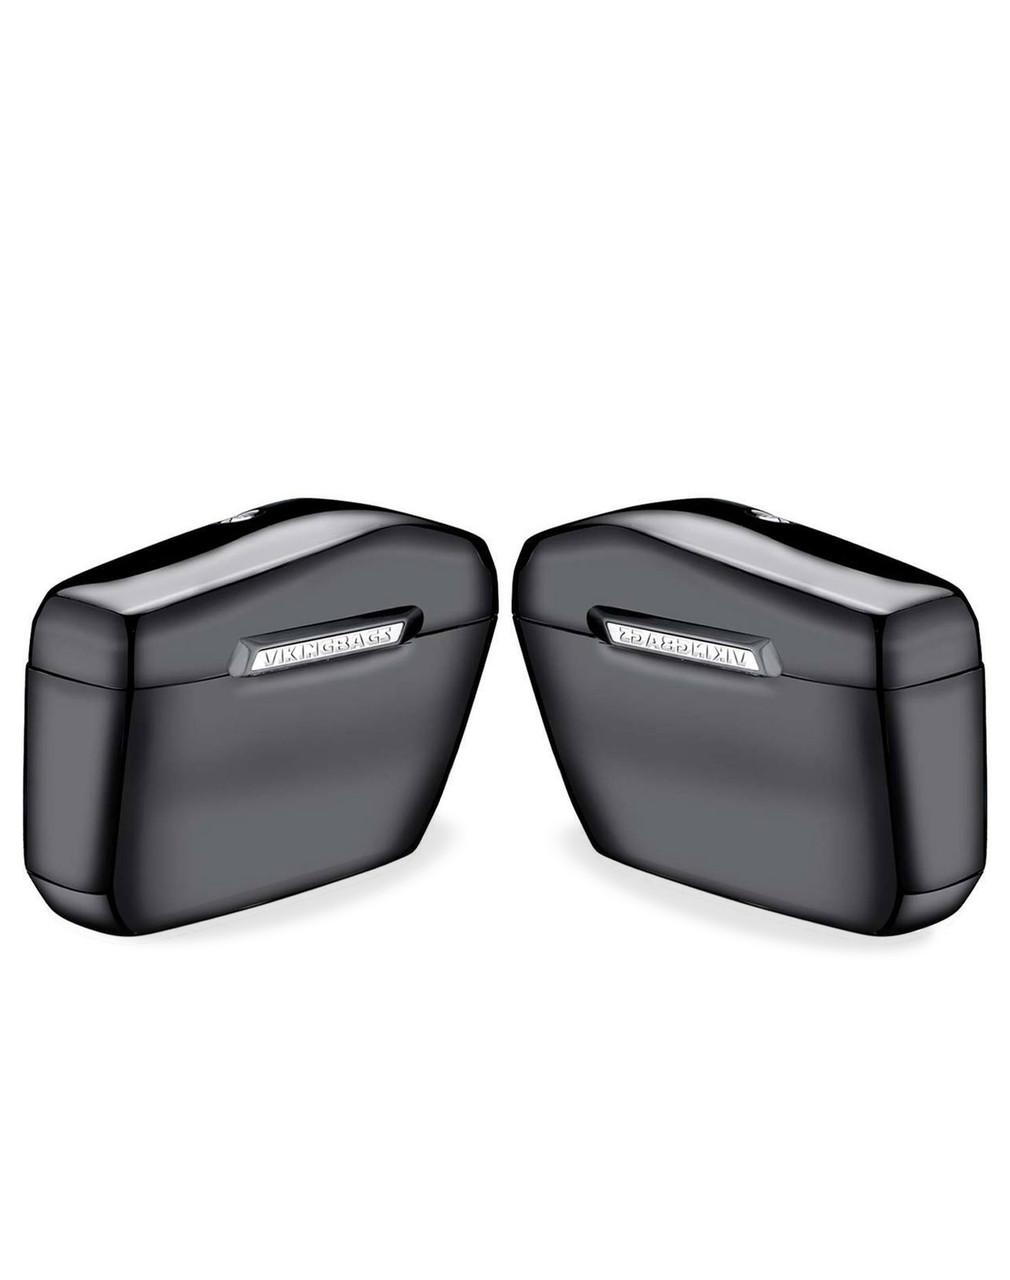 Honda CMX250C Rebel 250 Viking Lamellar Large Black Hard Saddlebags Both Bags View